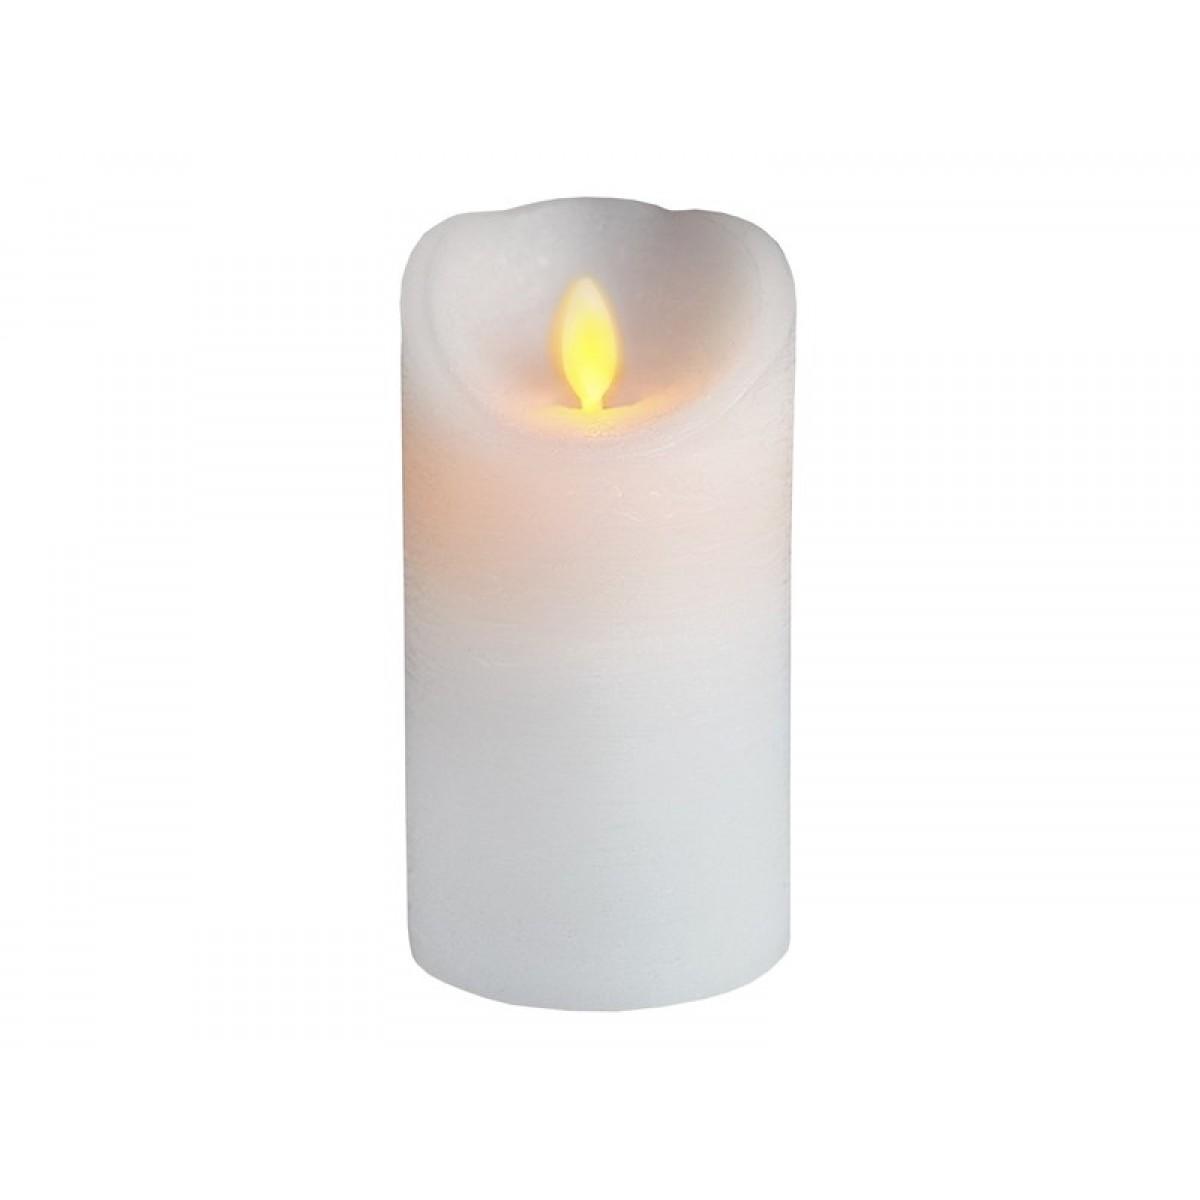 Bloklys Hvid - Bevægelig Flamme 7,5 x 15 cm.